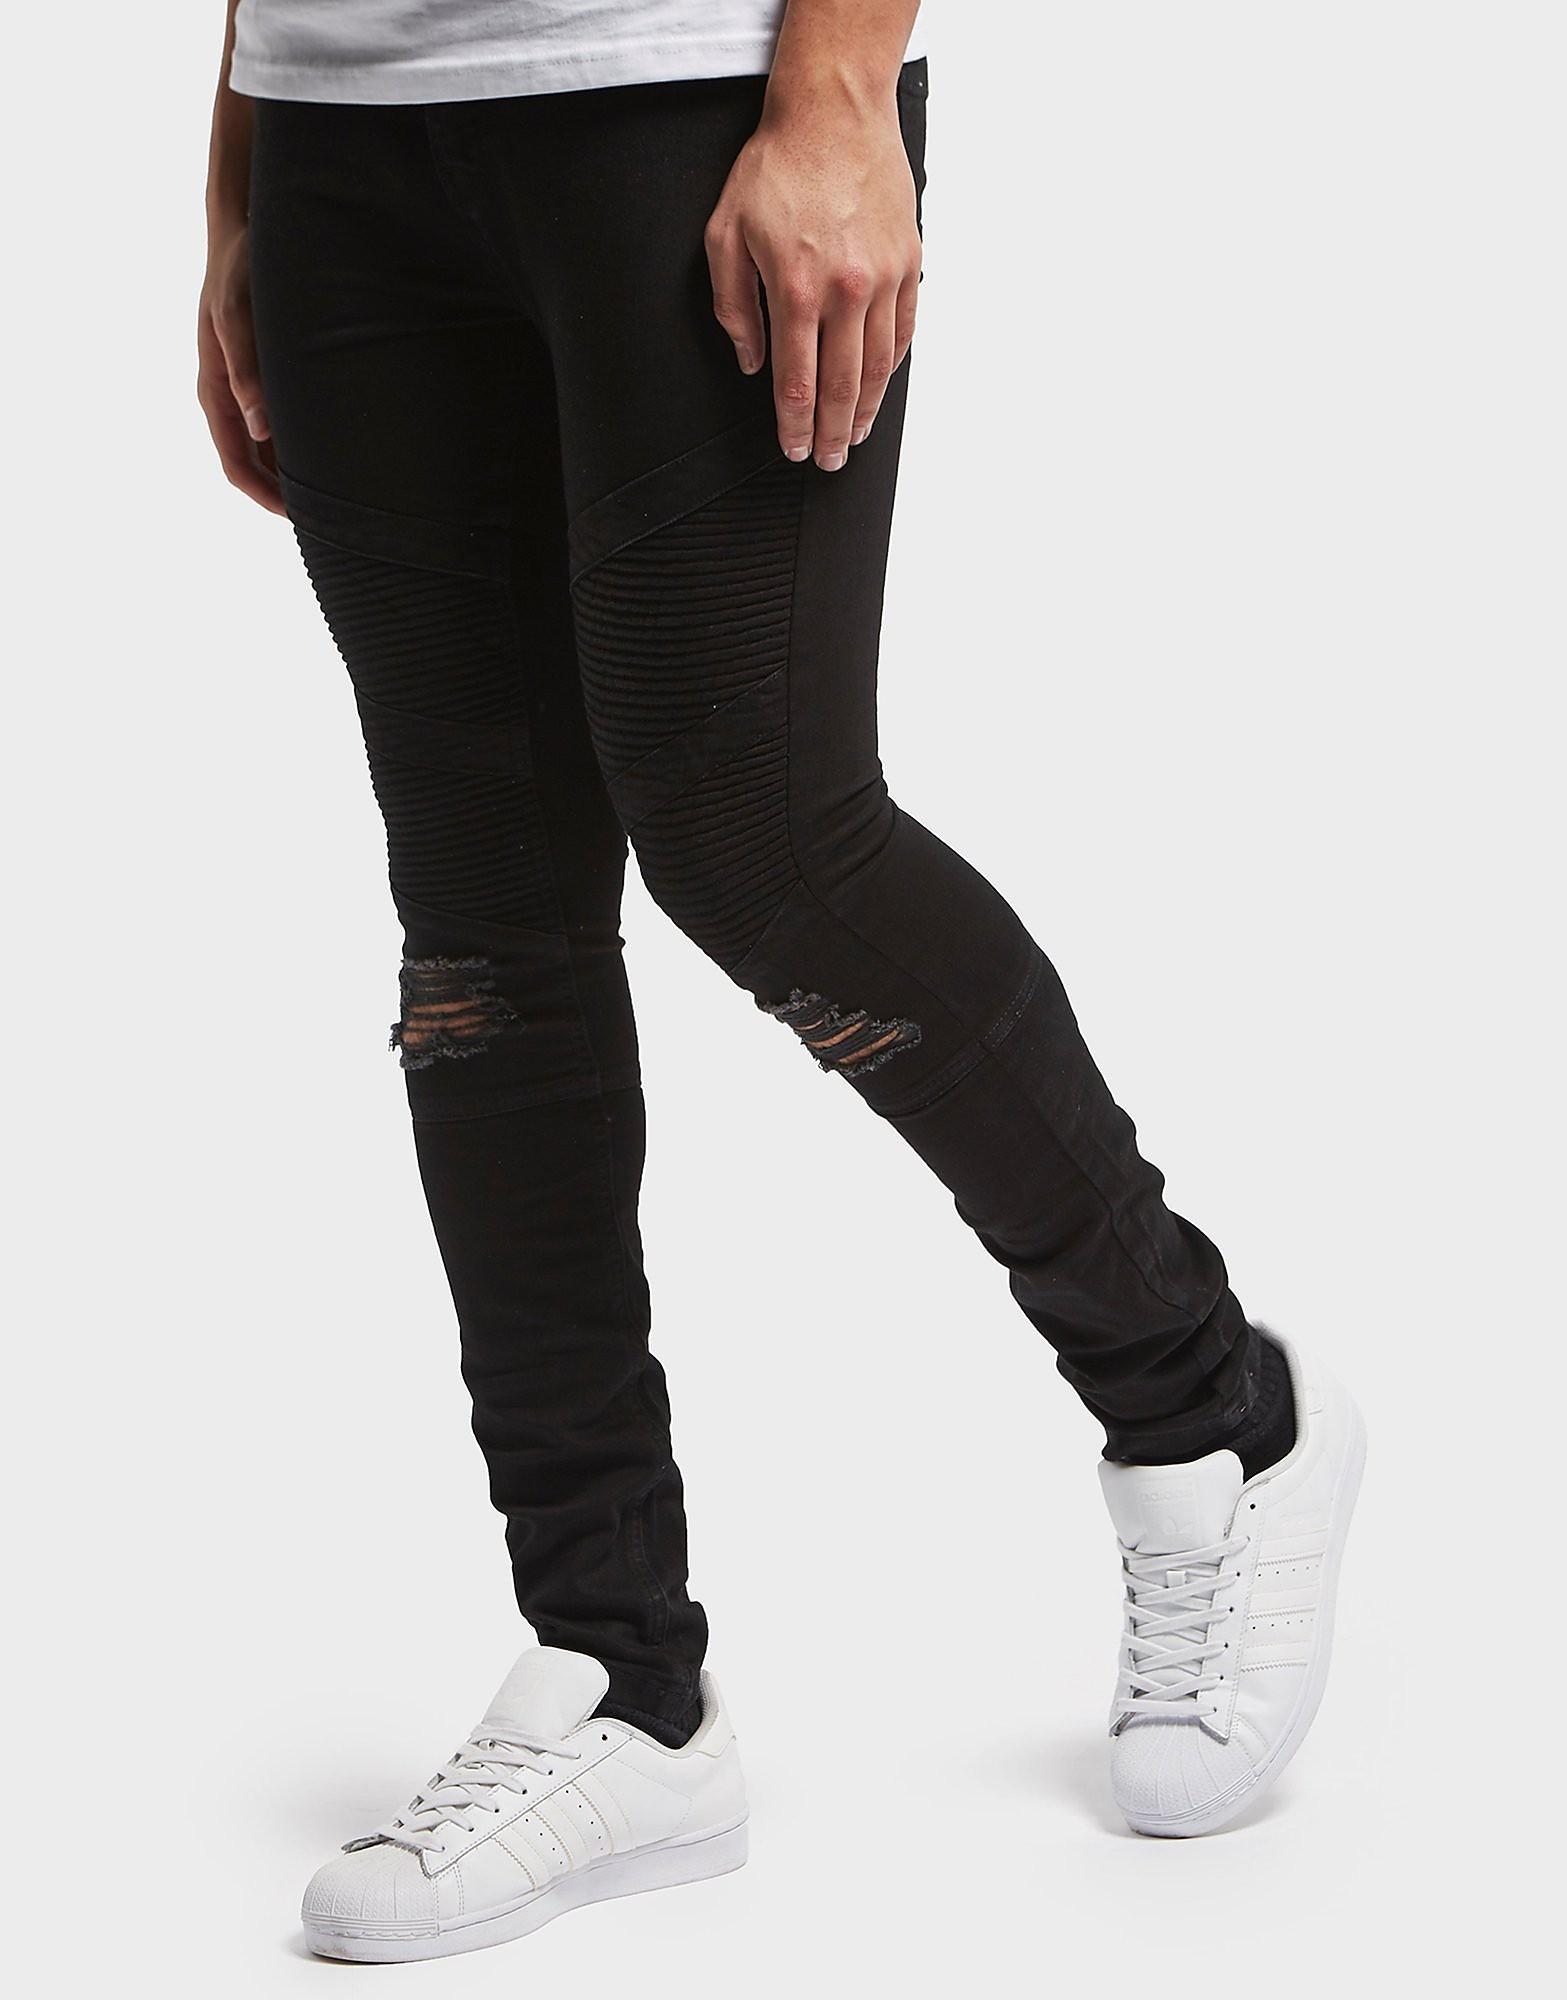 One True Saxon Biker Skinny Jeans - Exclusive